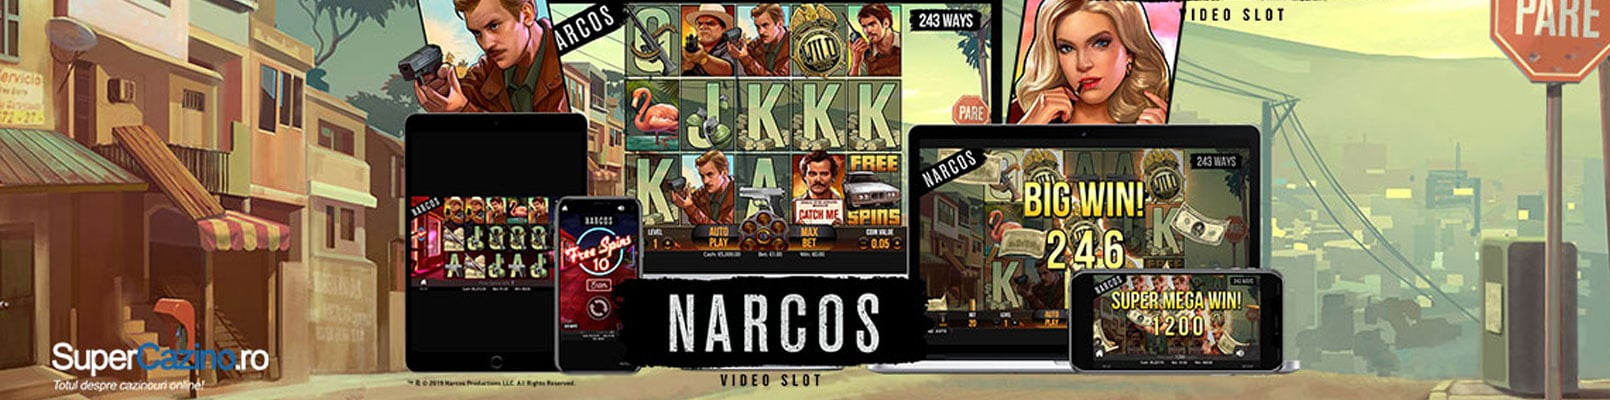 narcos slot online